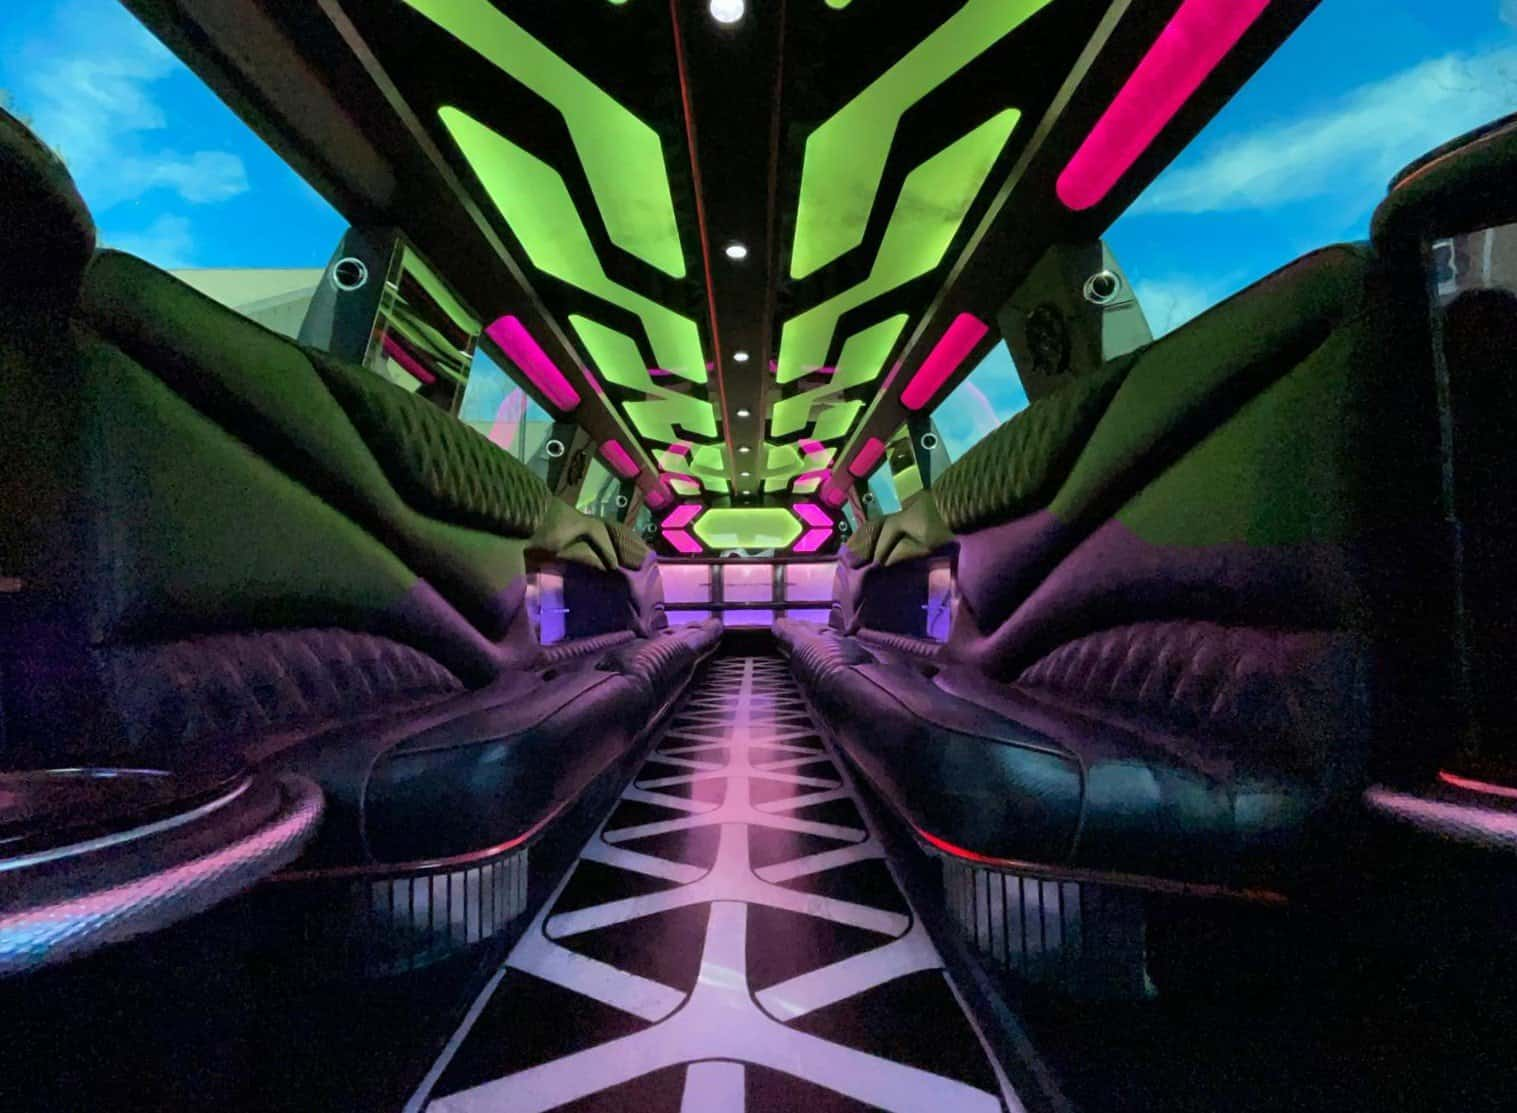 Interior with Lighting for Escalade Limo